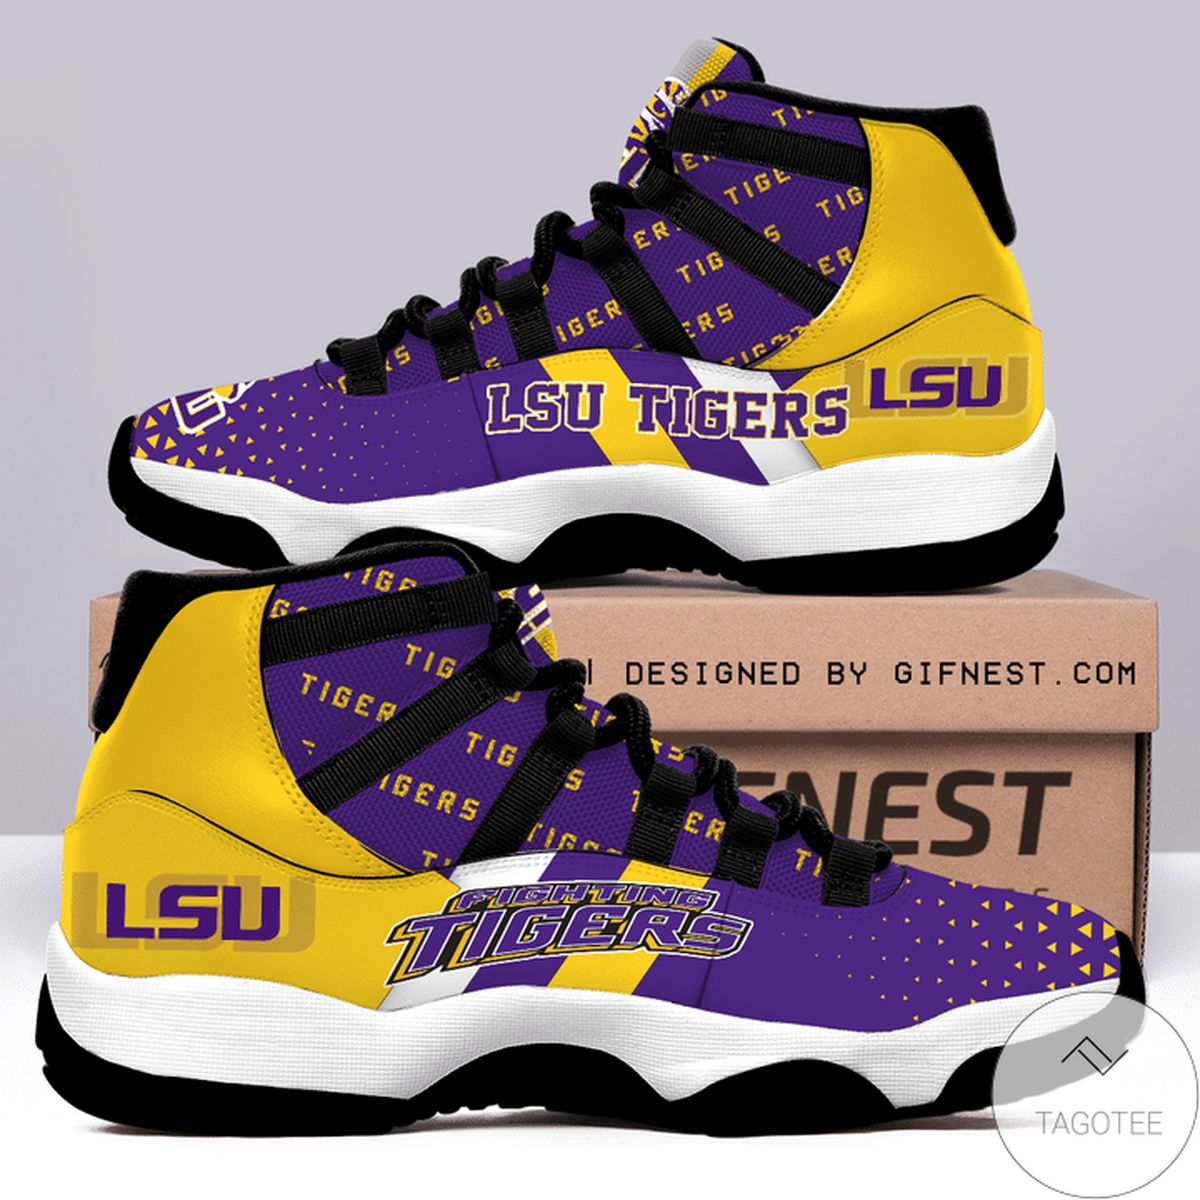 Lsu Tigers Air Jordan 11 Shoes